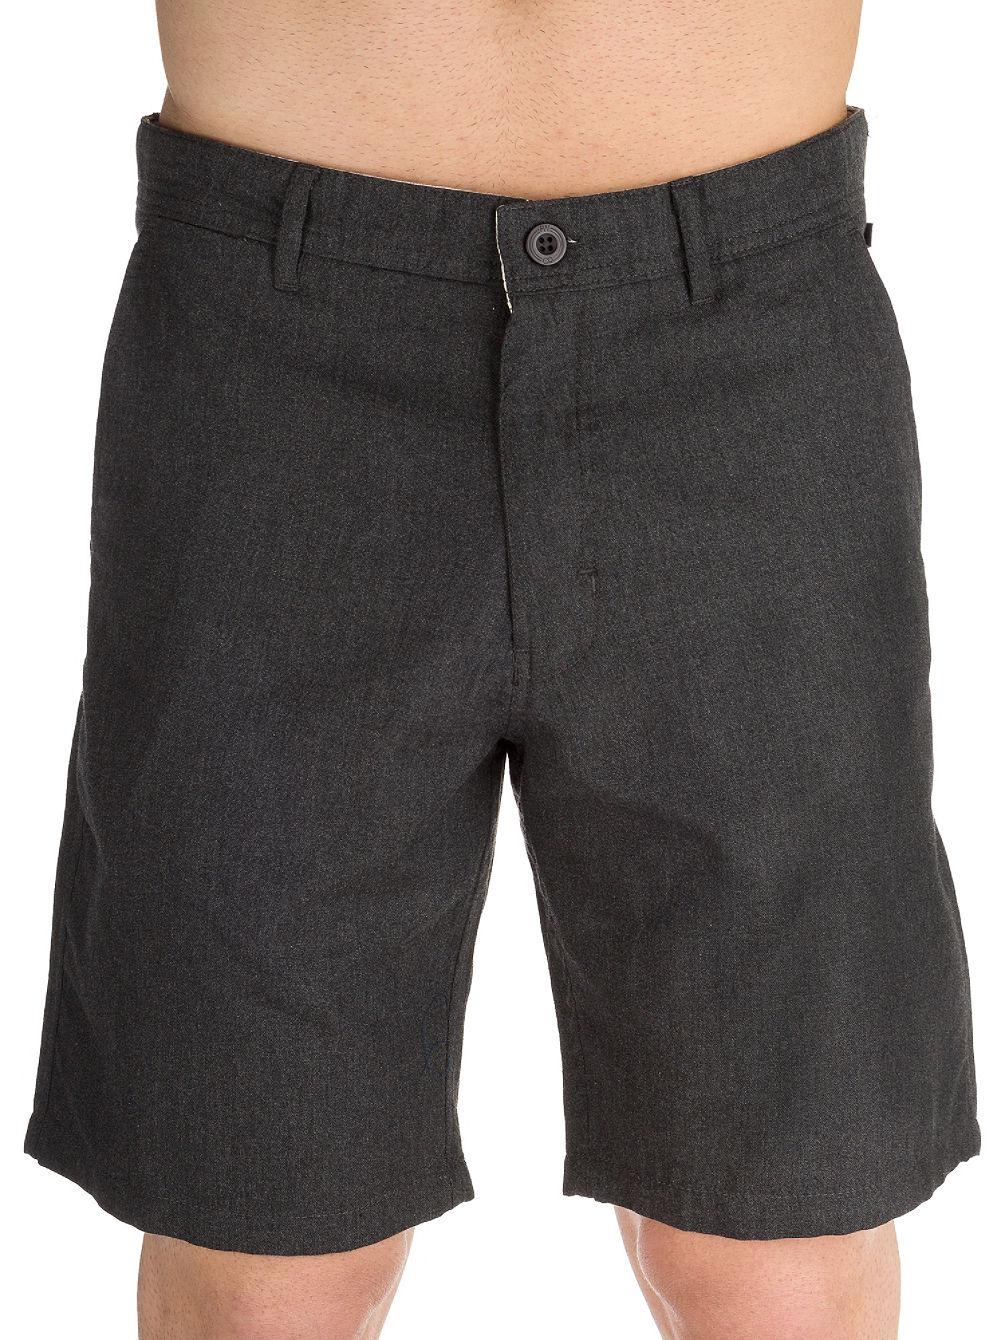 free-world-walker-shorts